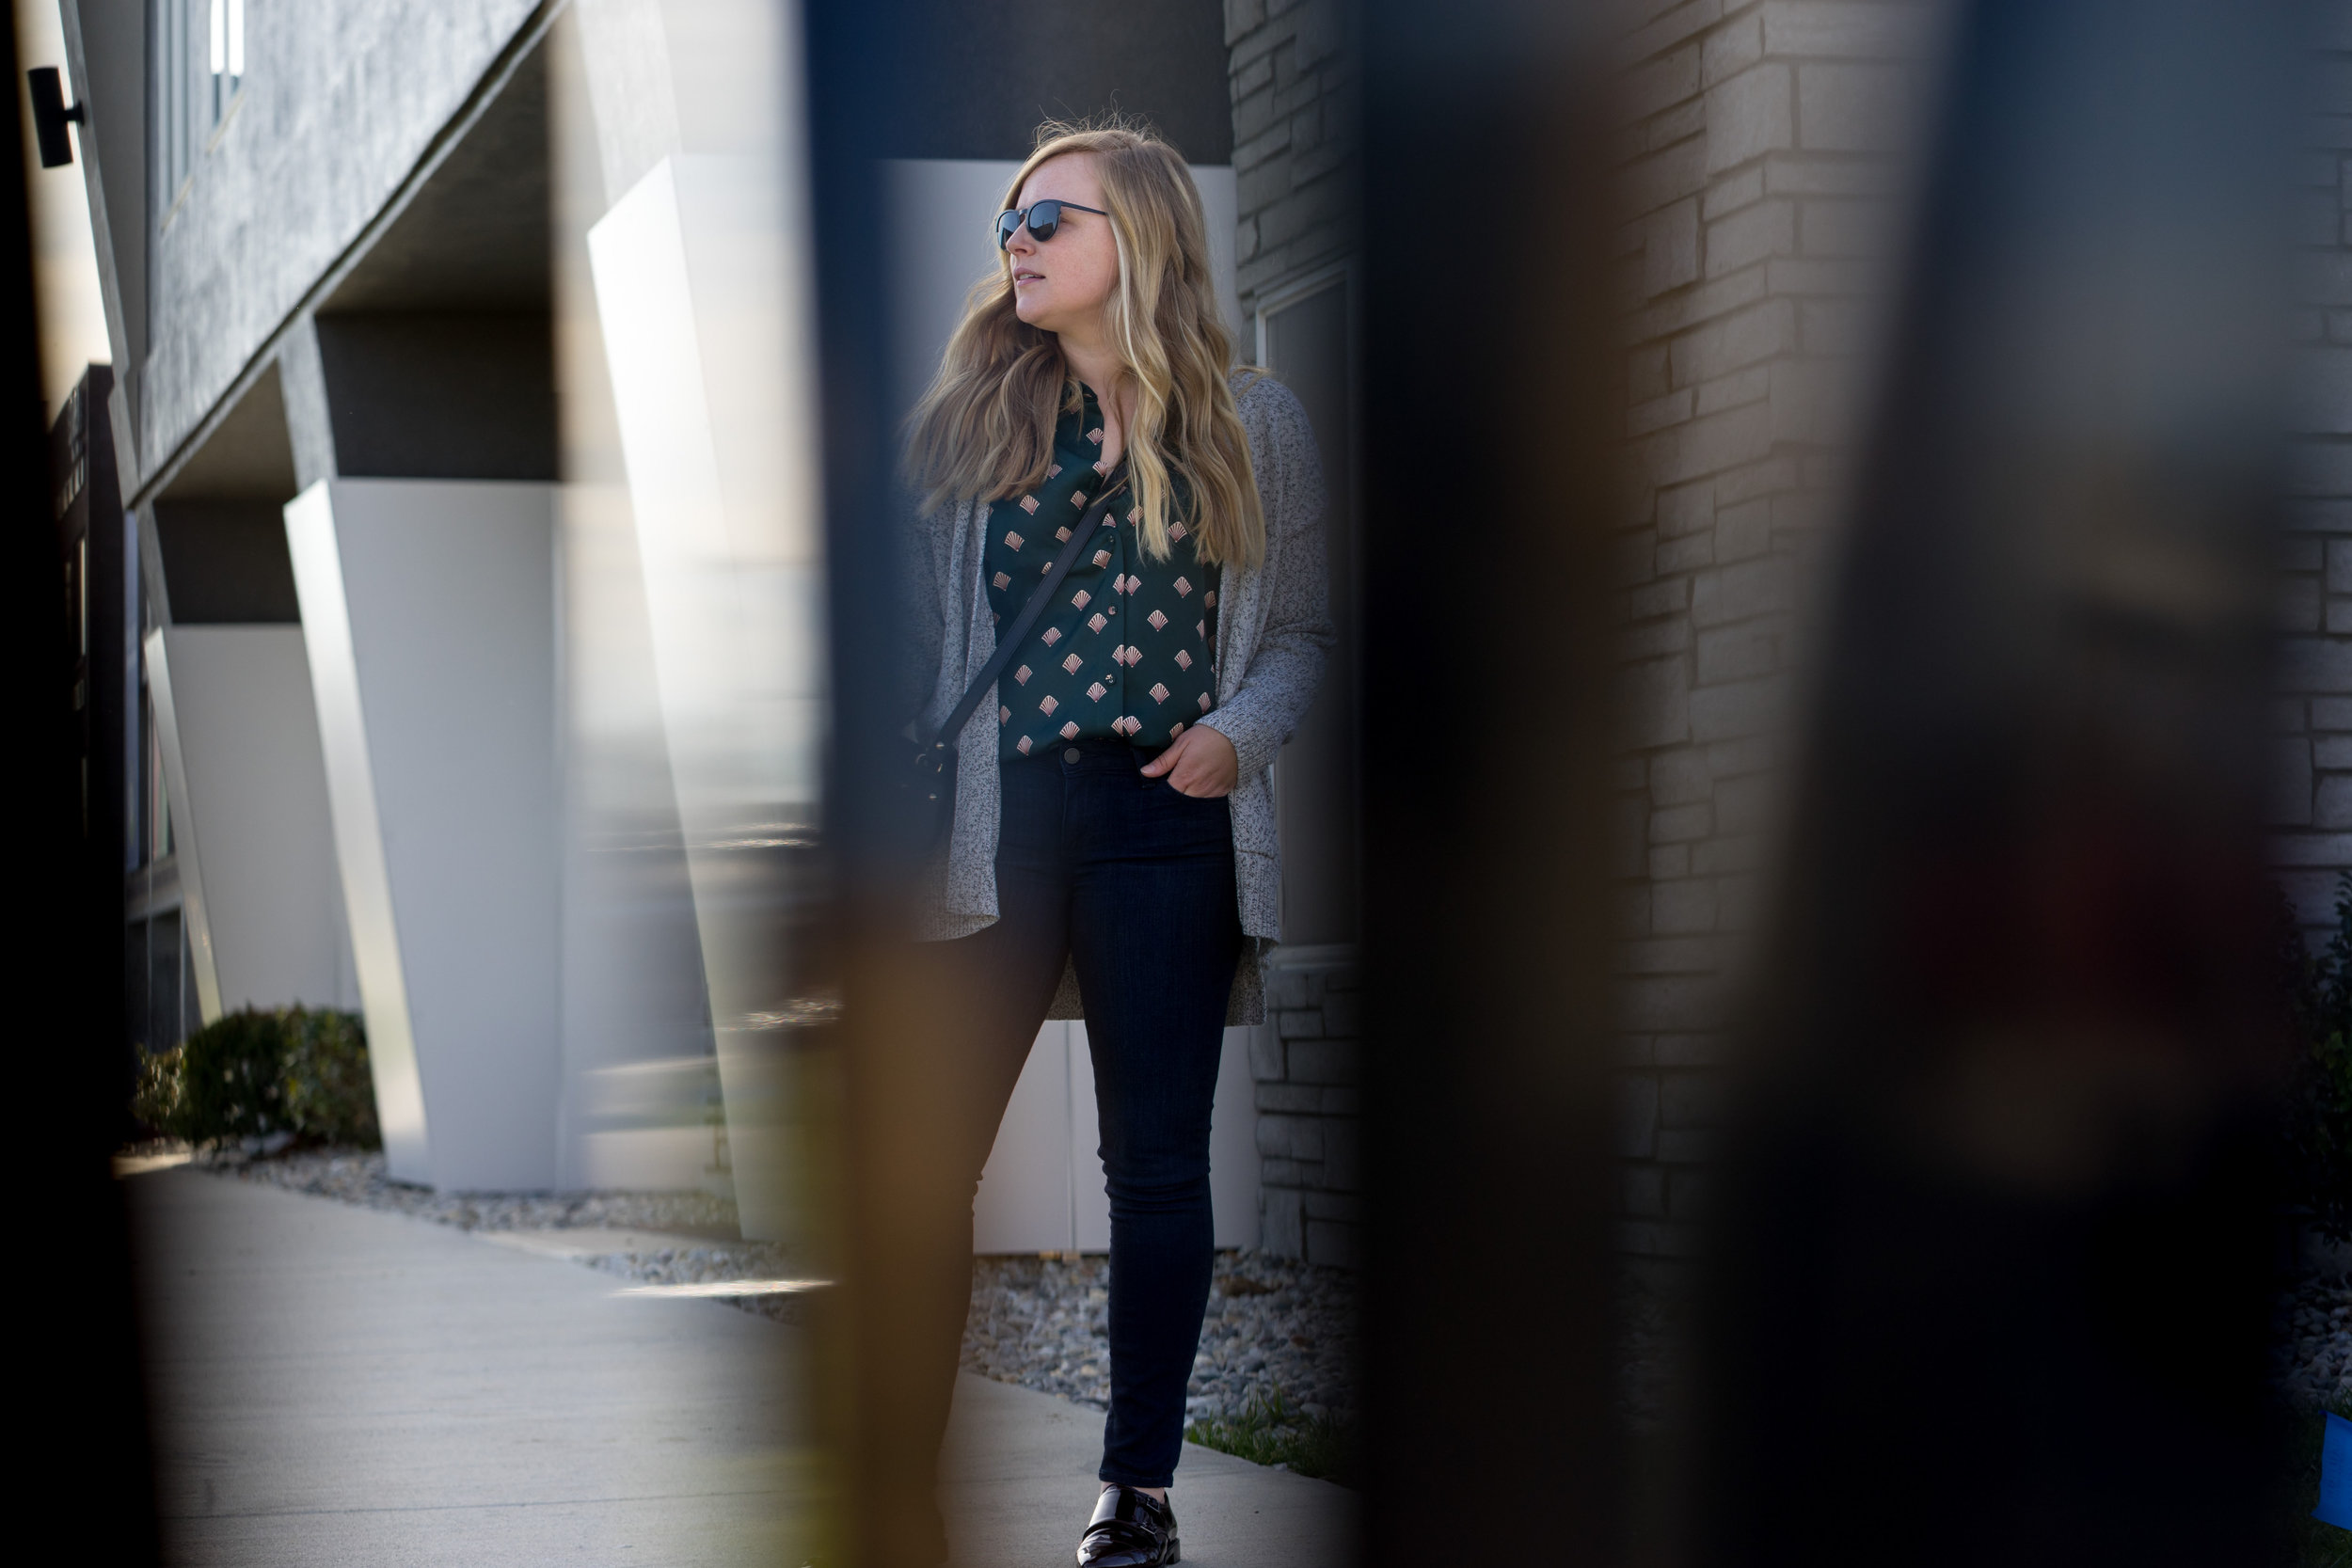 Maggie a la Mode - L'Academie The Classic Shell Print Shirt, Madewell Midland Cardigan Sweater, Paige Verdugo Transcend Ankle Jeans Mae, APC Half Moon Bag, Aquatalia Harlow Monk Strap Loafers